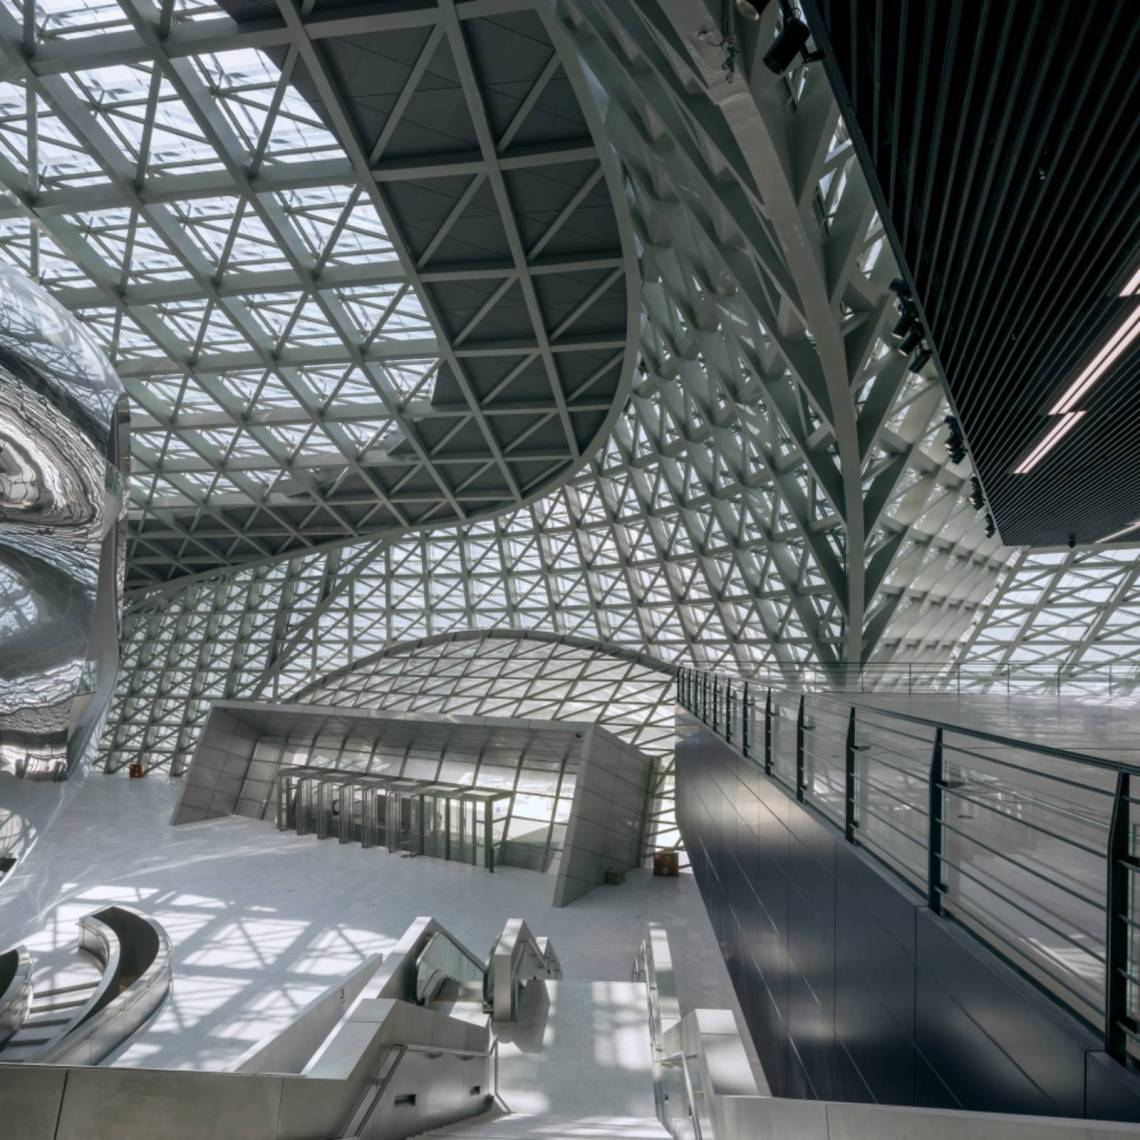 Museum of Contemporary Art & Planning Exhibition (MOCAPE)